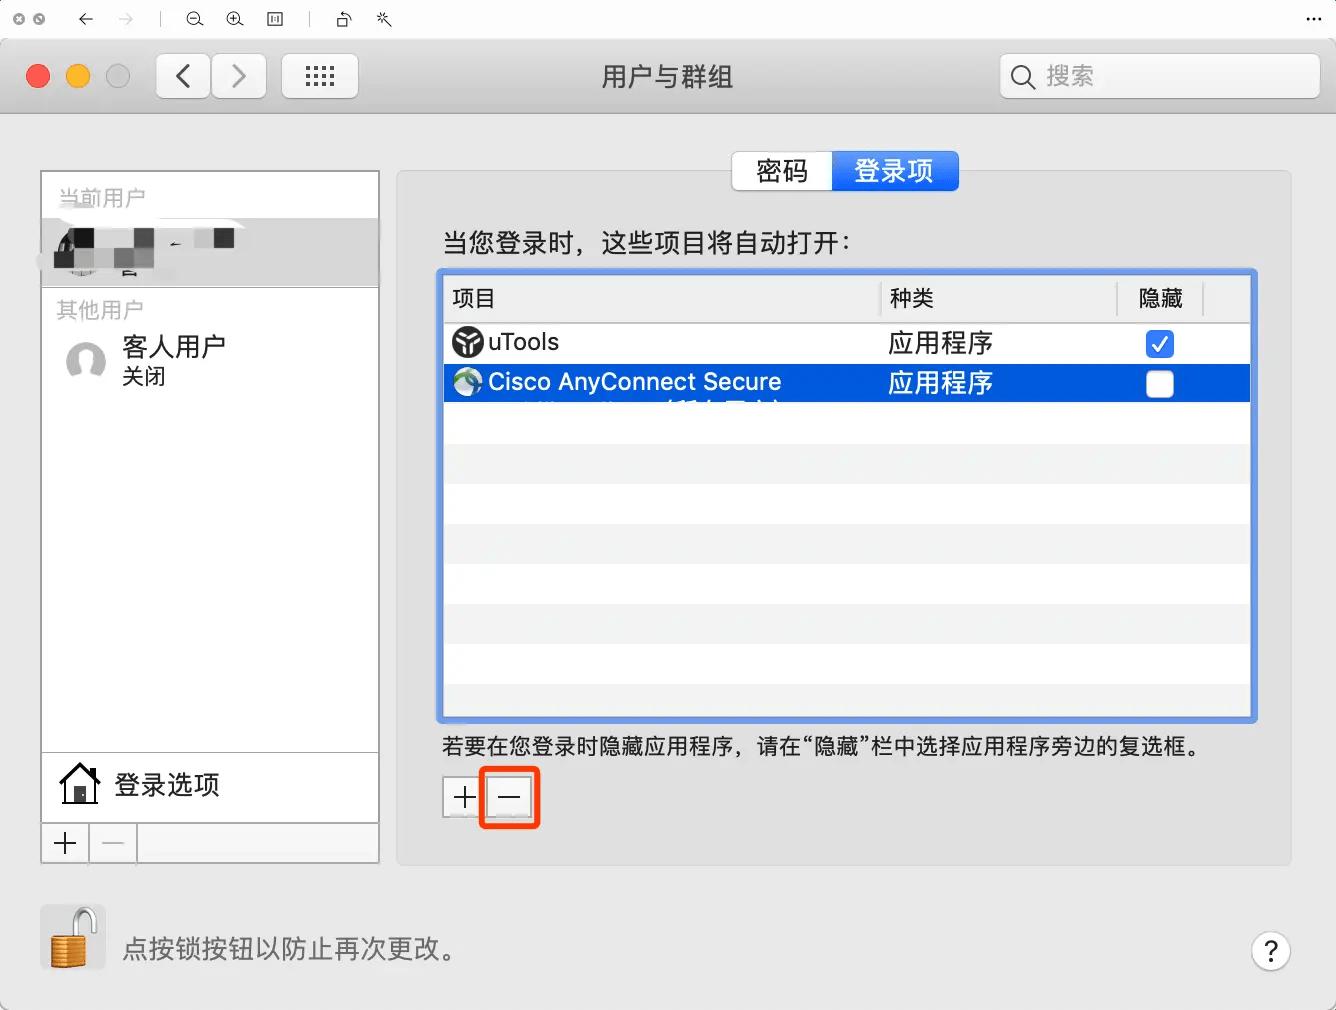 Mac 開機禁止啟動 AnyConnect 客戶端 - 簡書